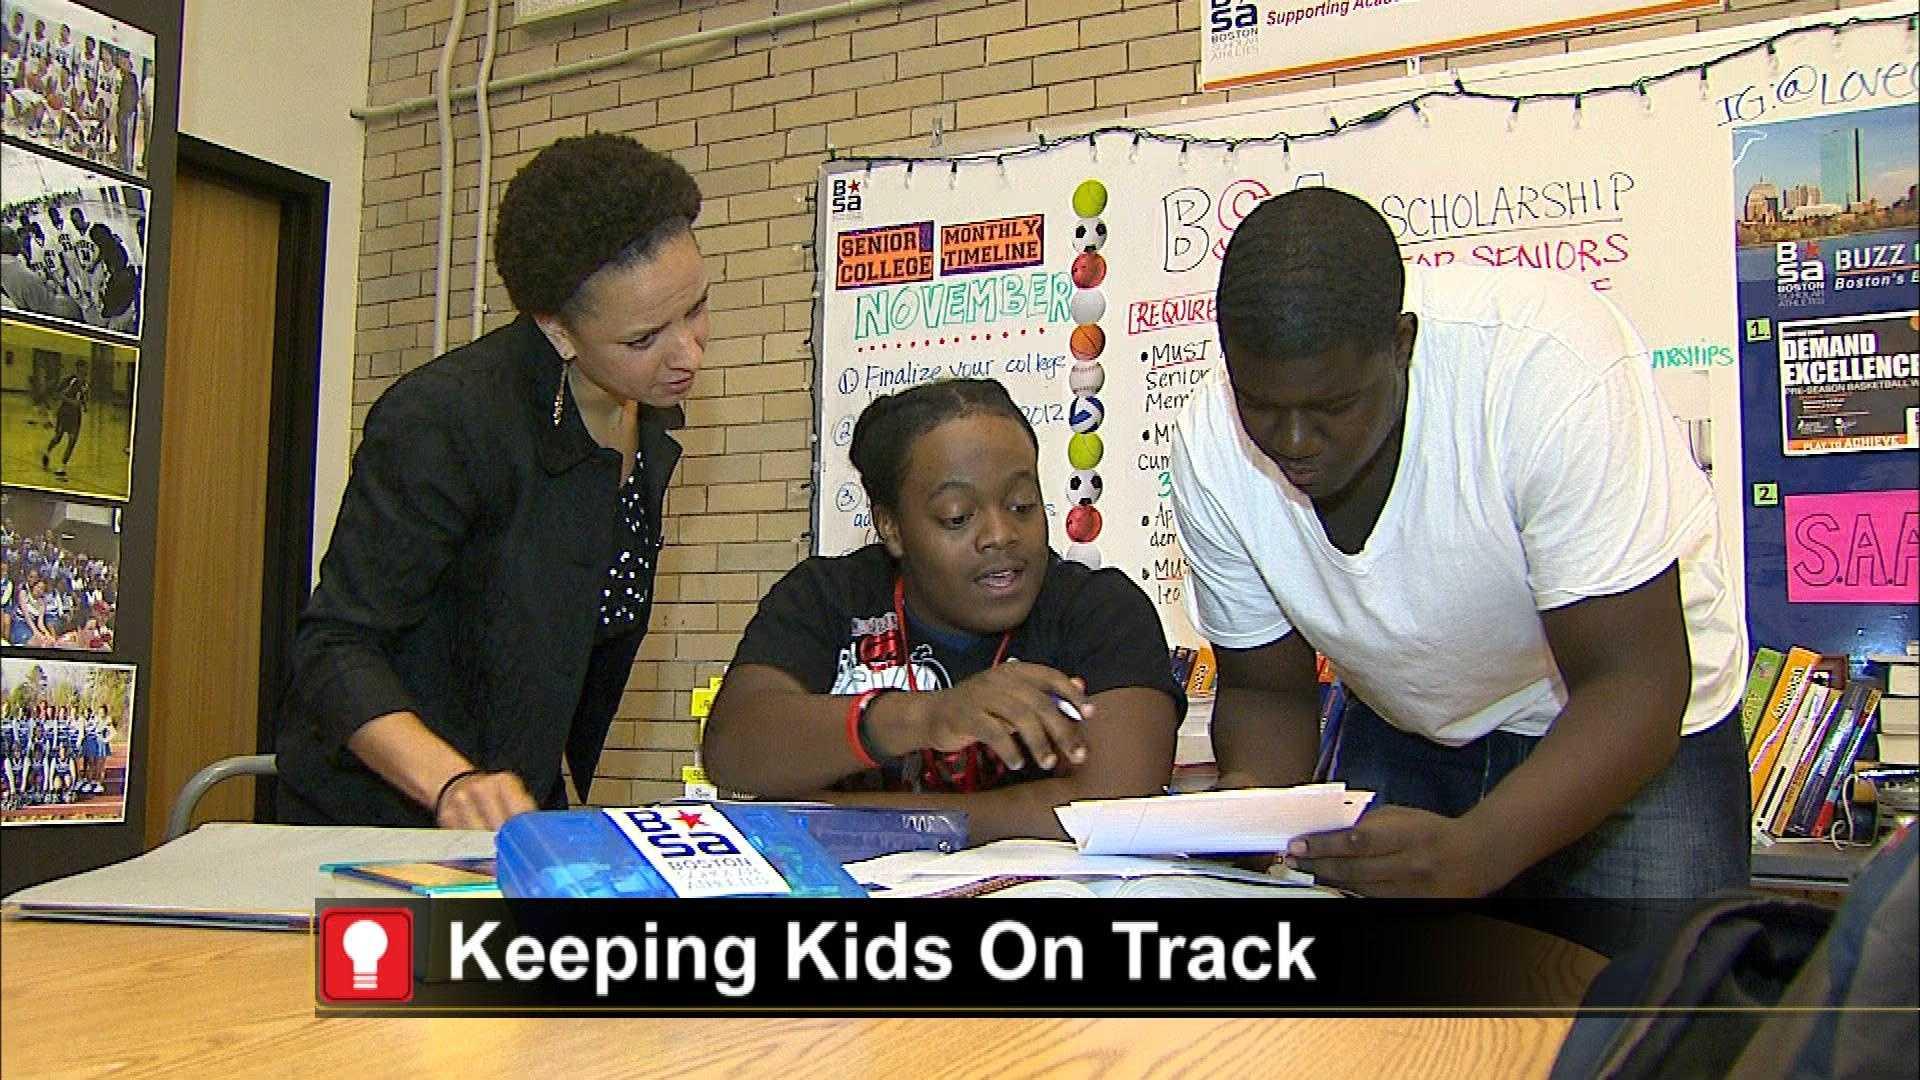 Image: Keeping Kids on Track